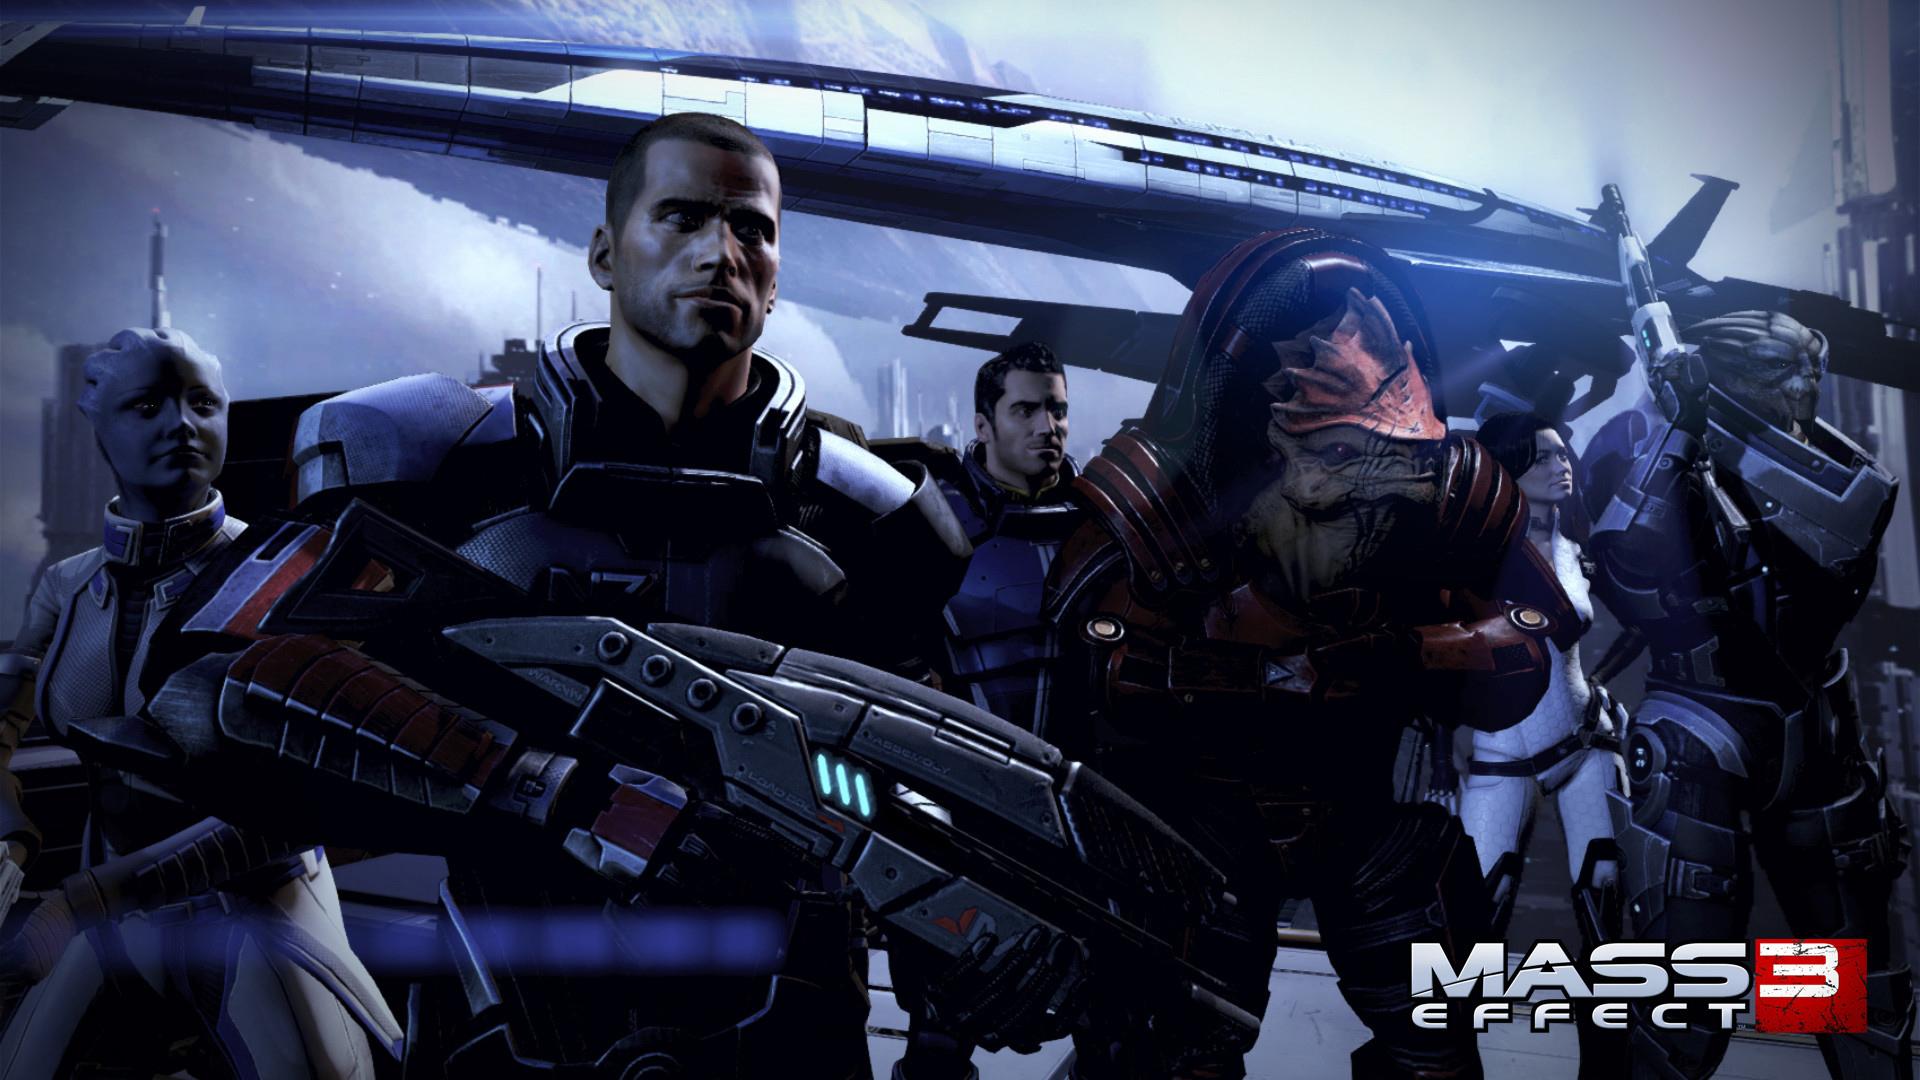 Steam adds Star Wars Battlefront, Battlefield, and more EA games screenshot